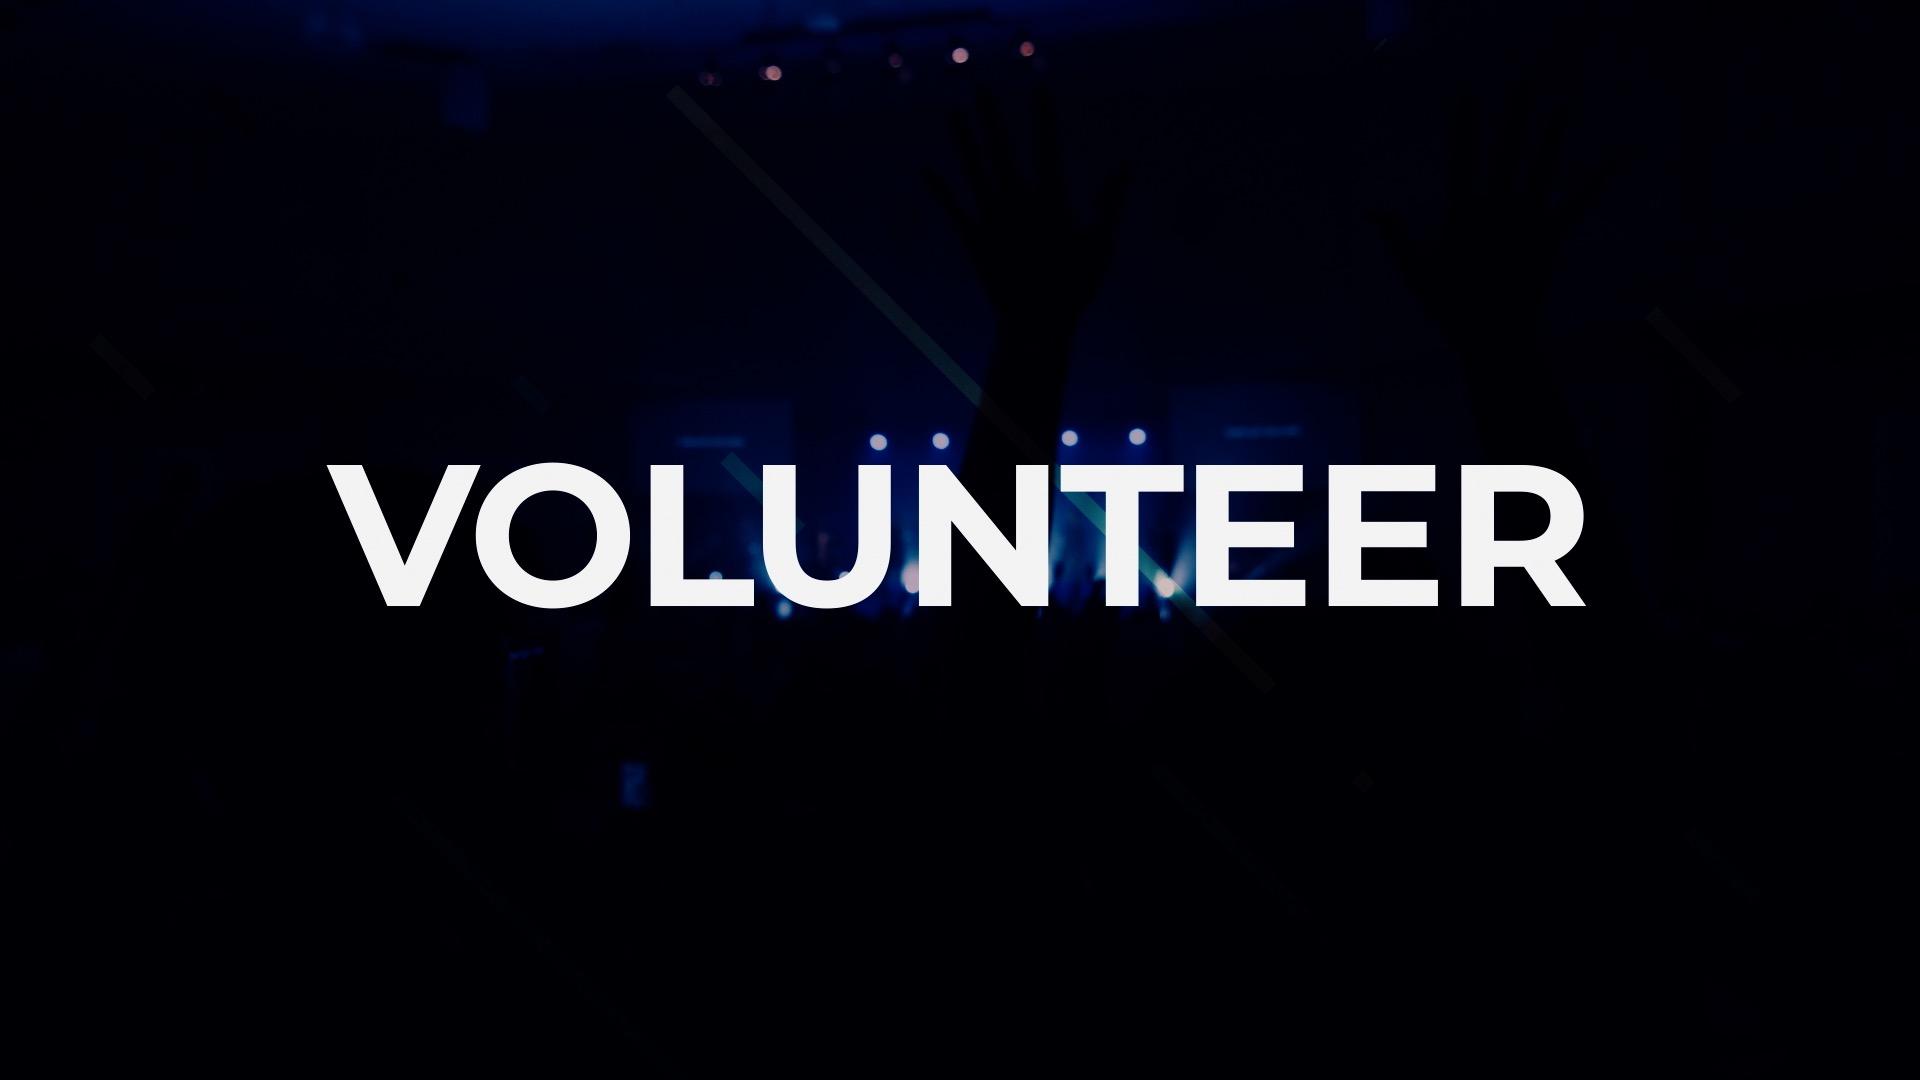 VMC-Volunteer-05-Title.jpg